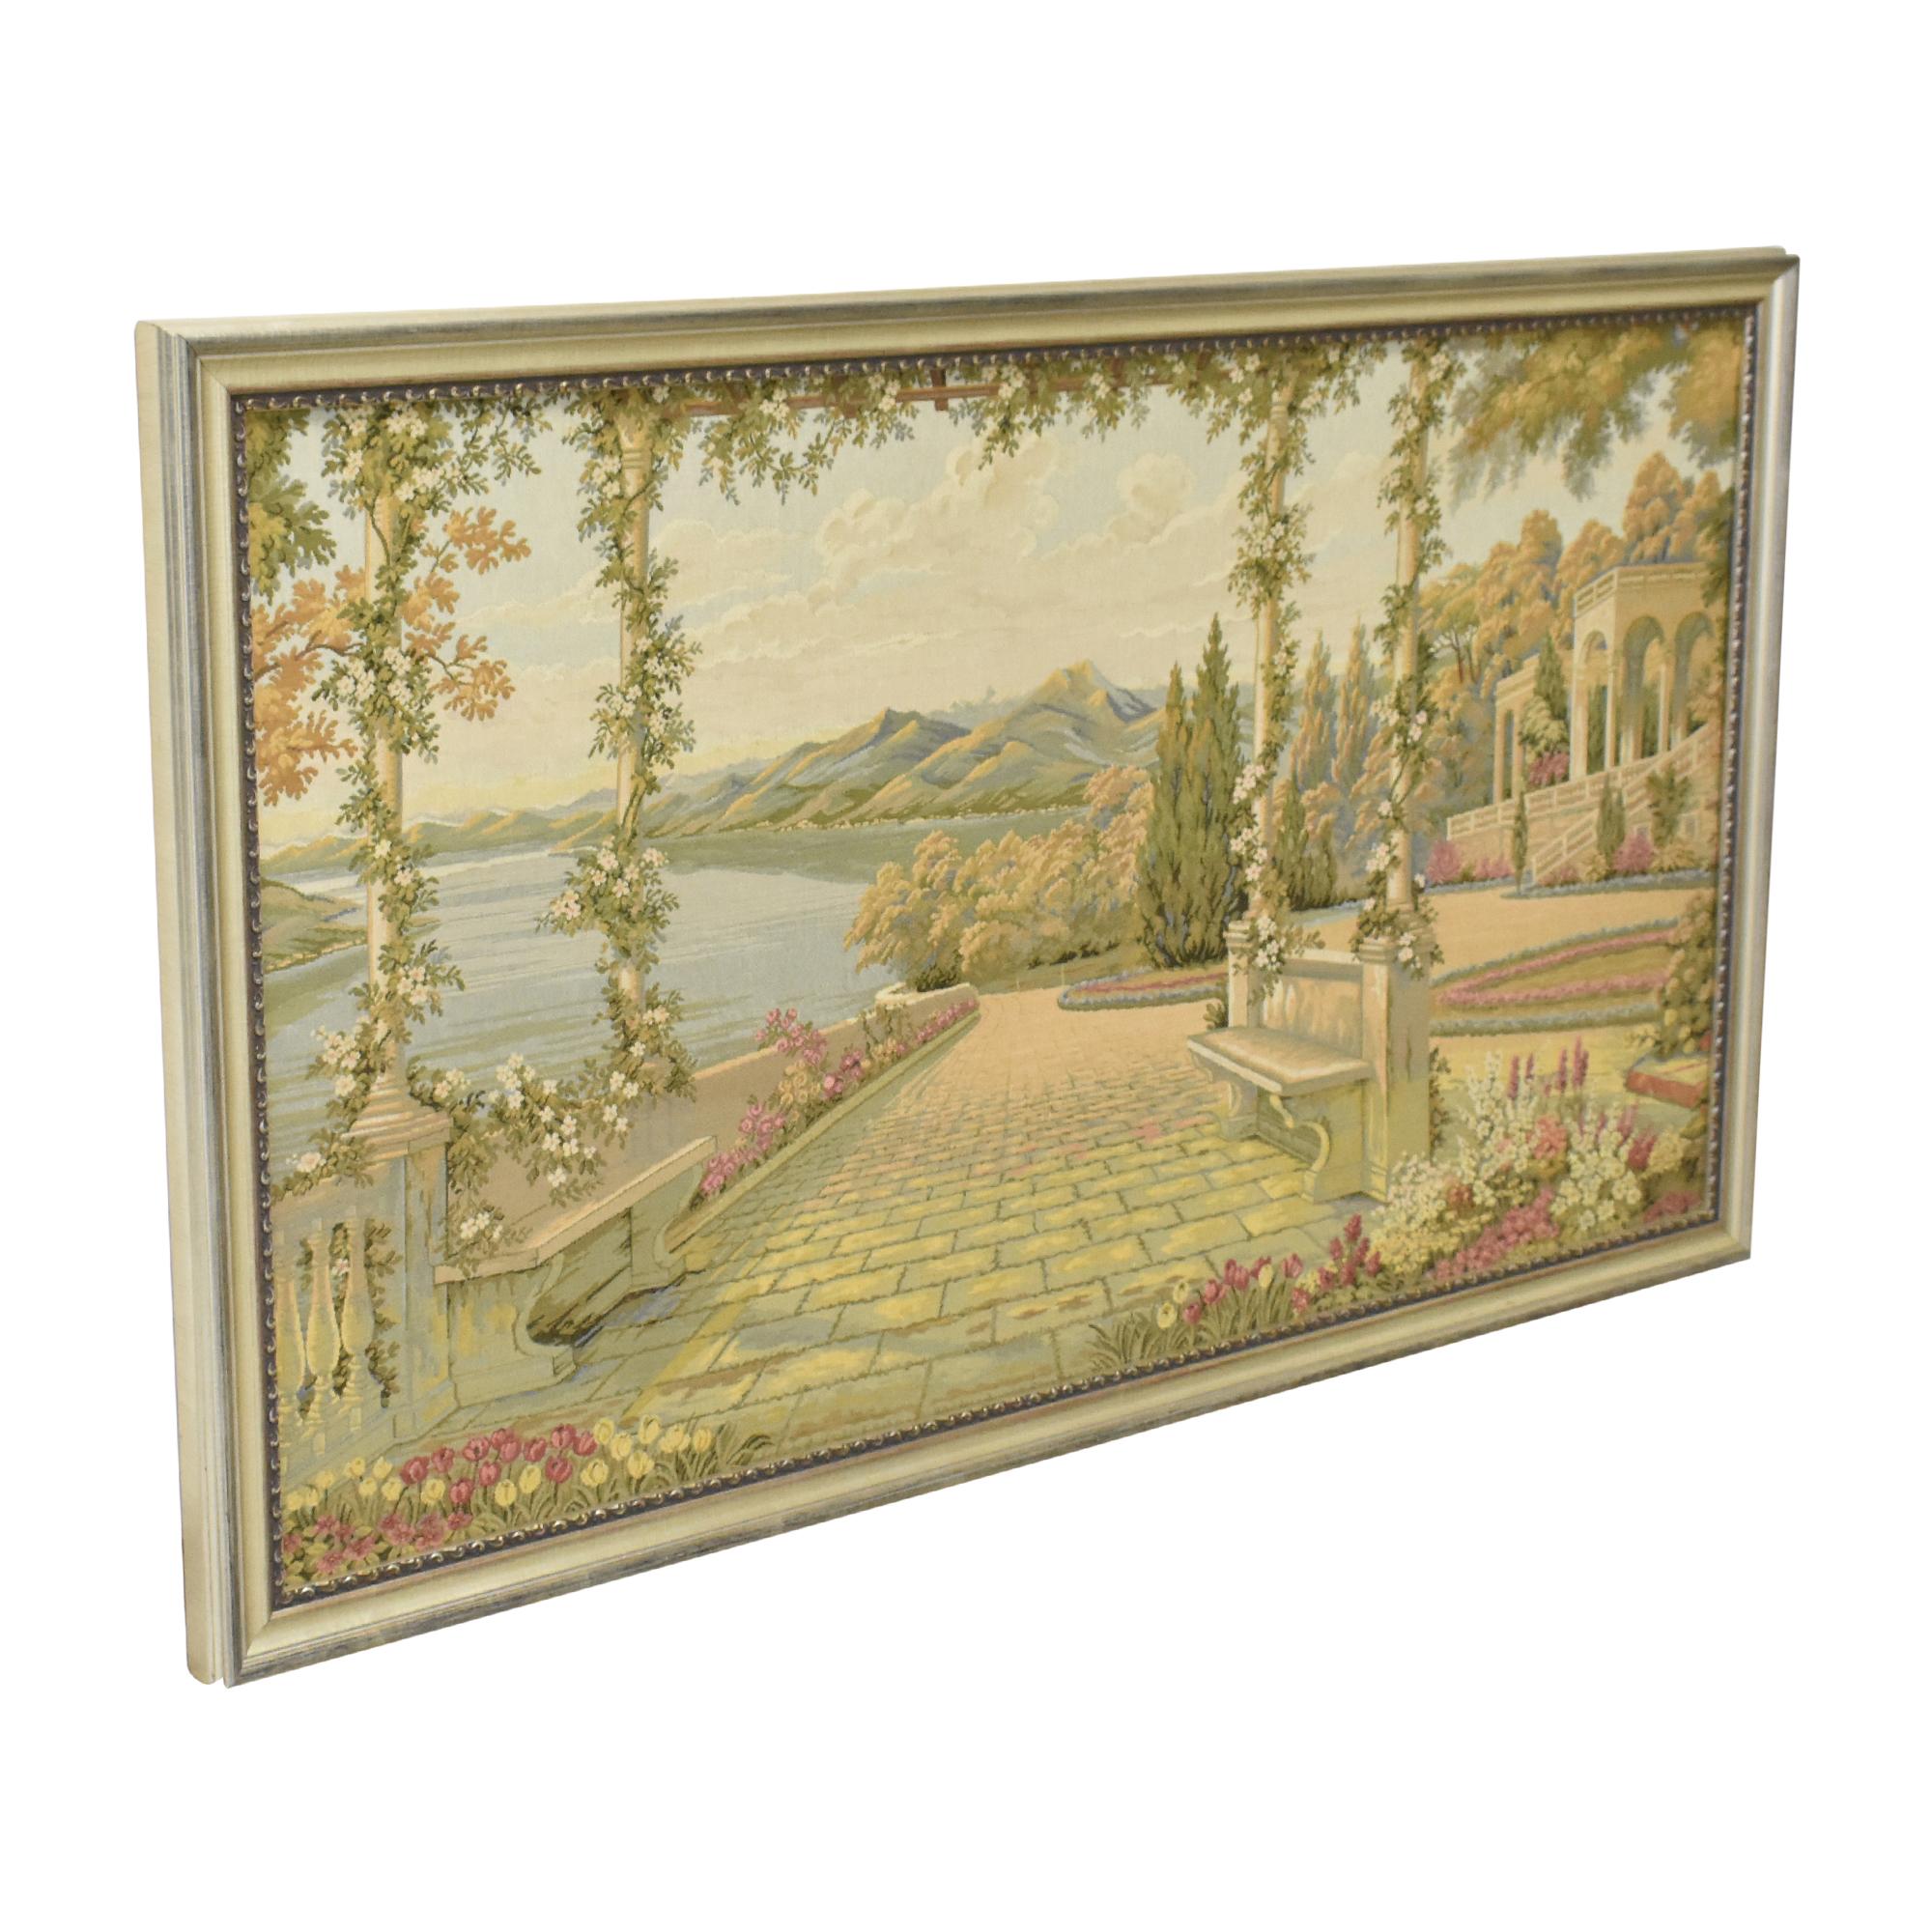 Framed Lake Como Tapestry ma